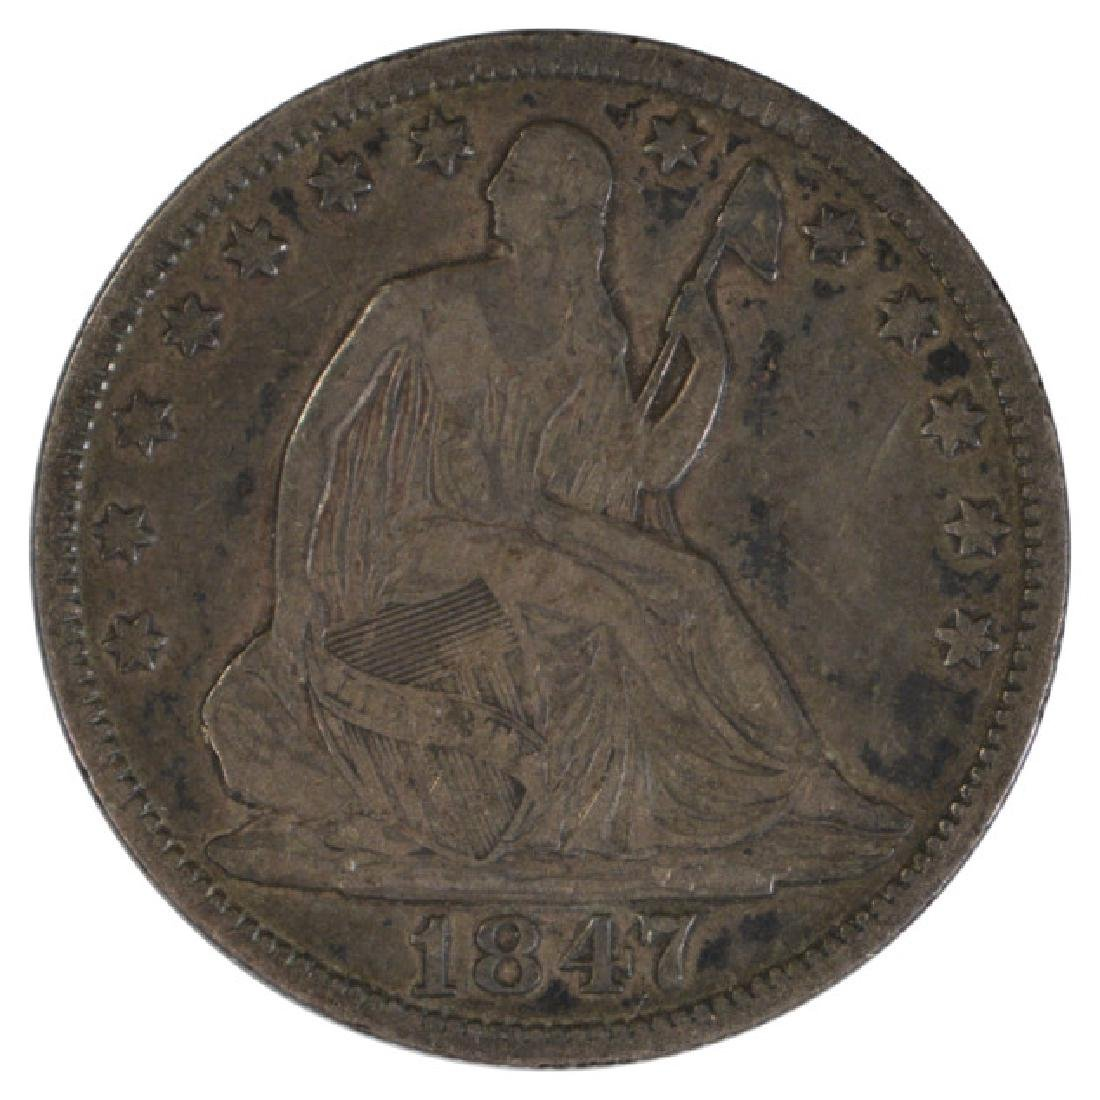 1847 Liberty Seated Half Dollar Coin